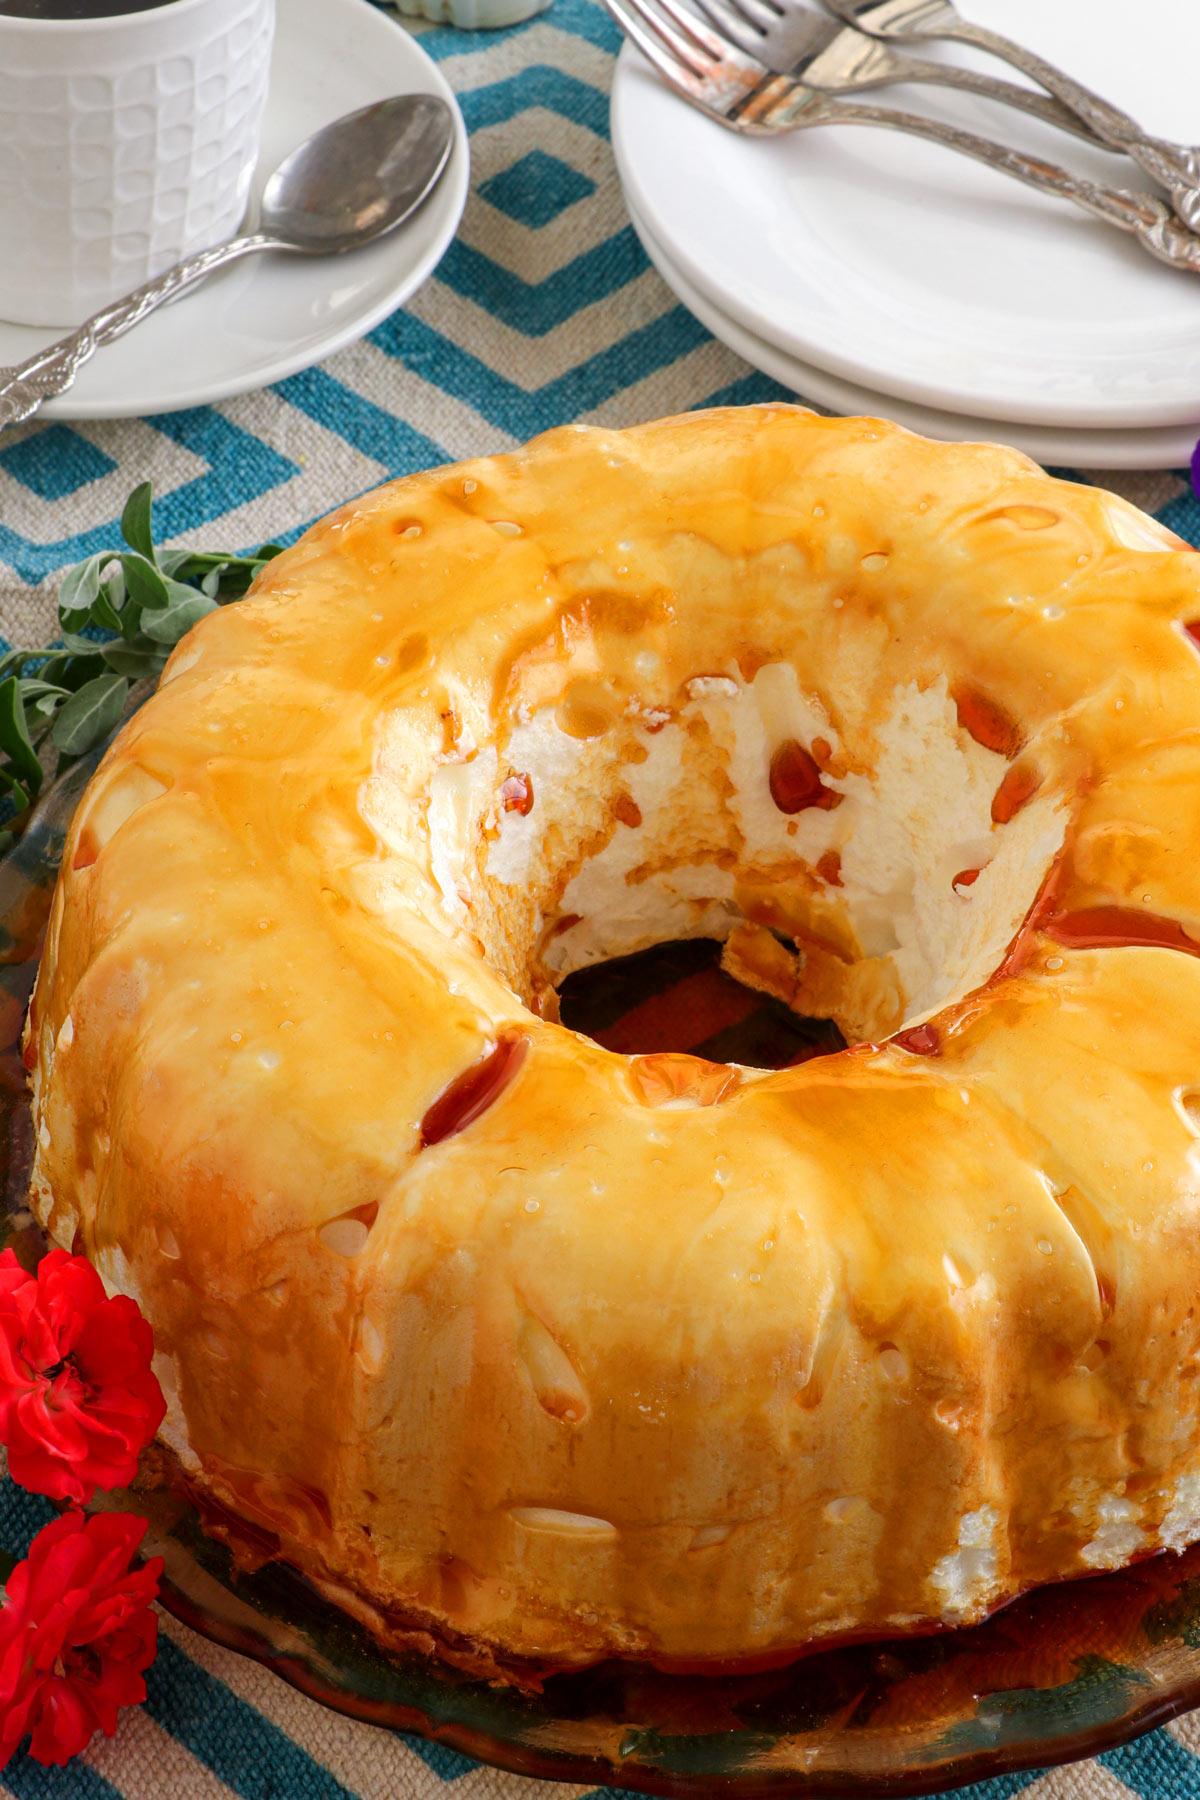 Cloud Cake or Molotof- a meringue-based pudding glazed with sugar caramel.